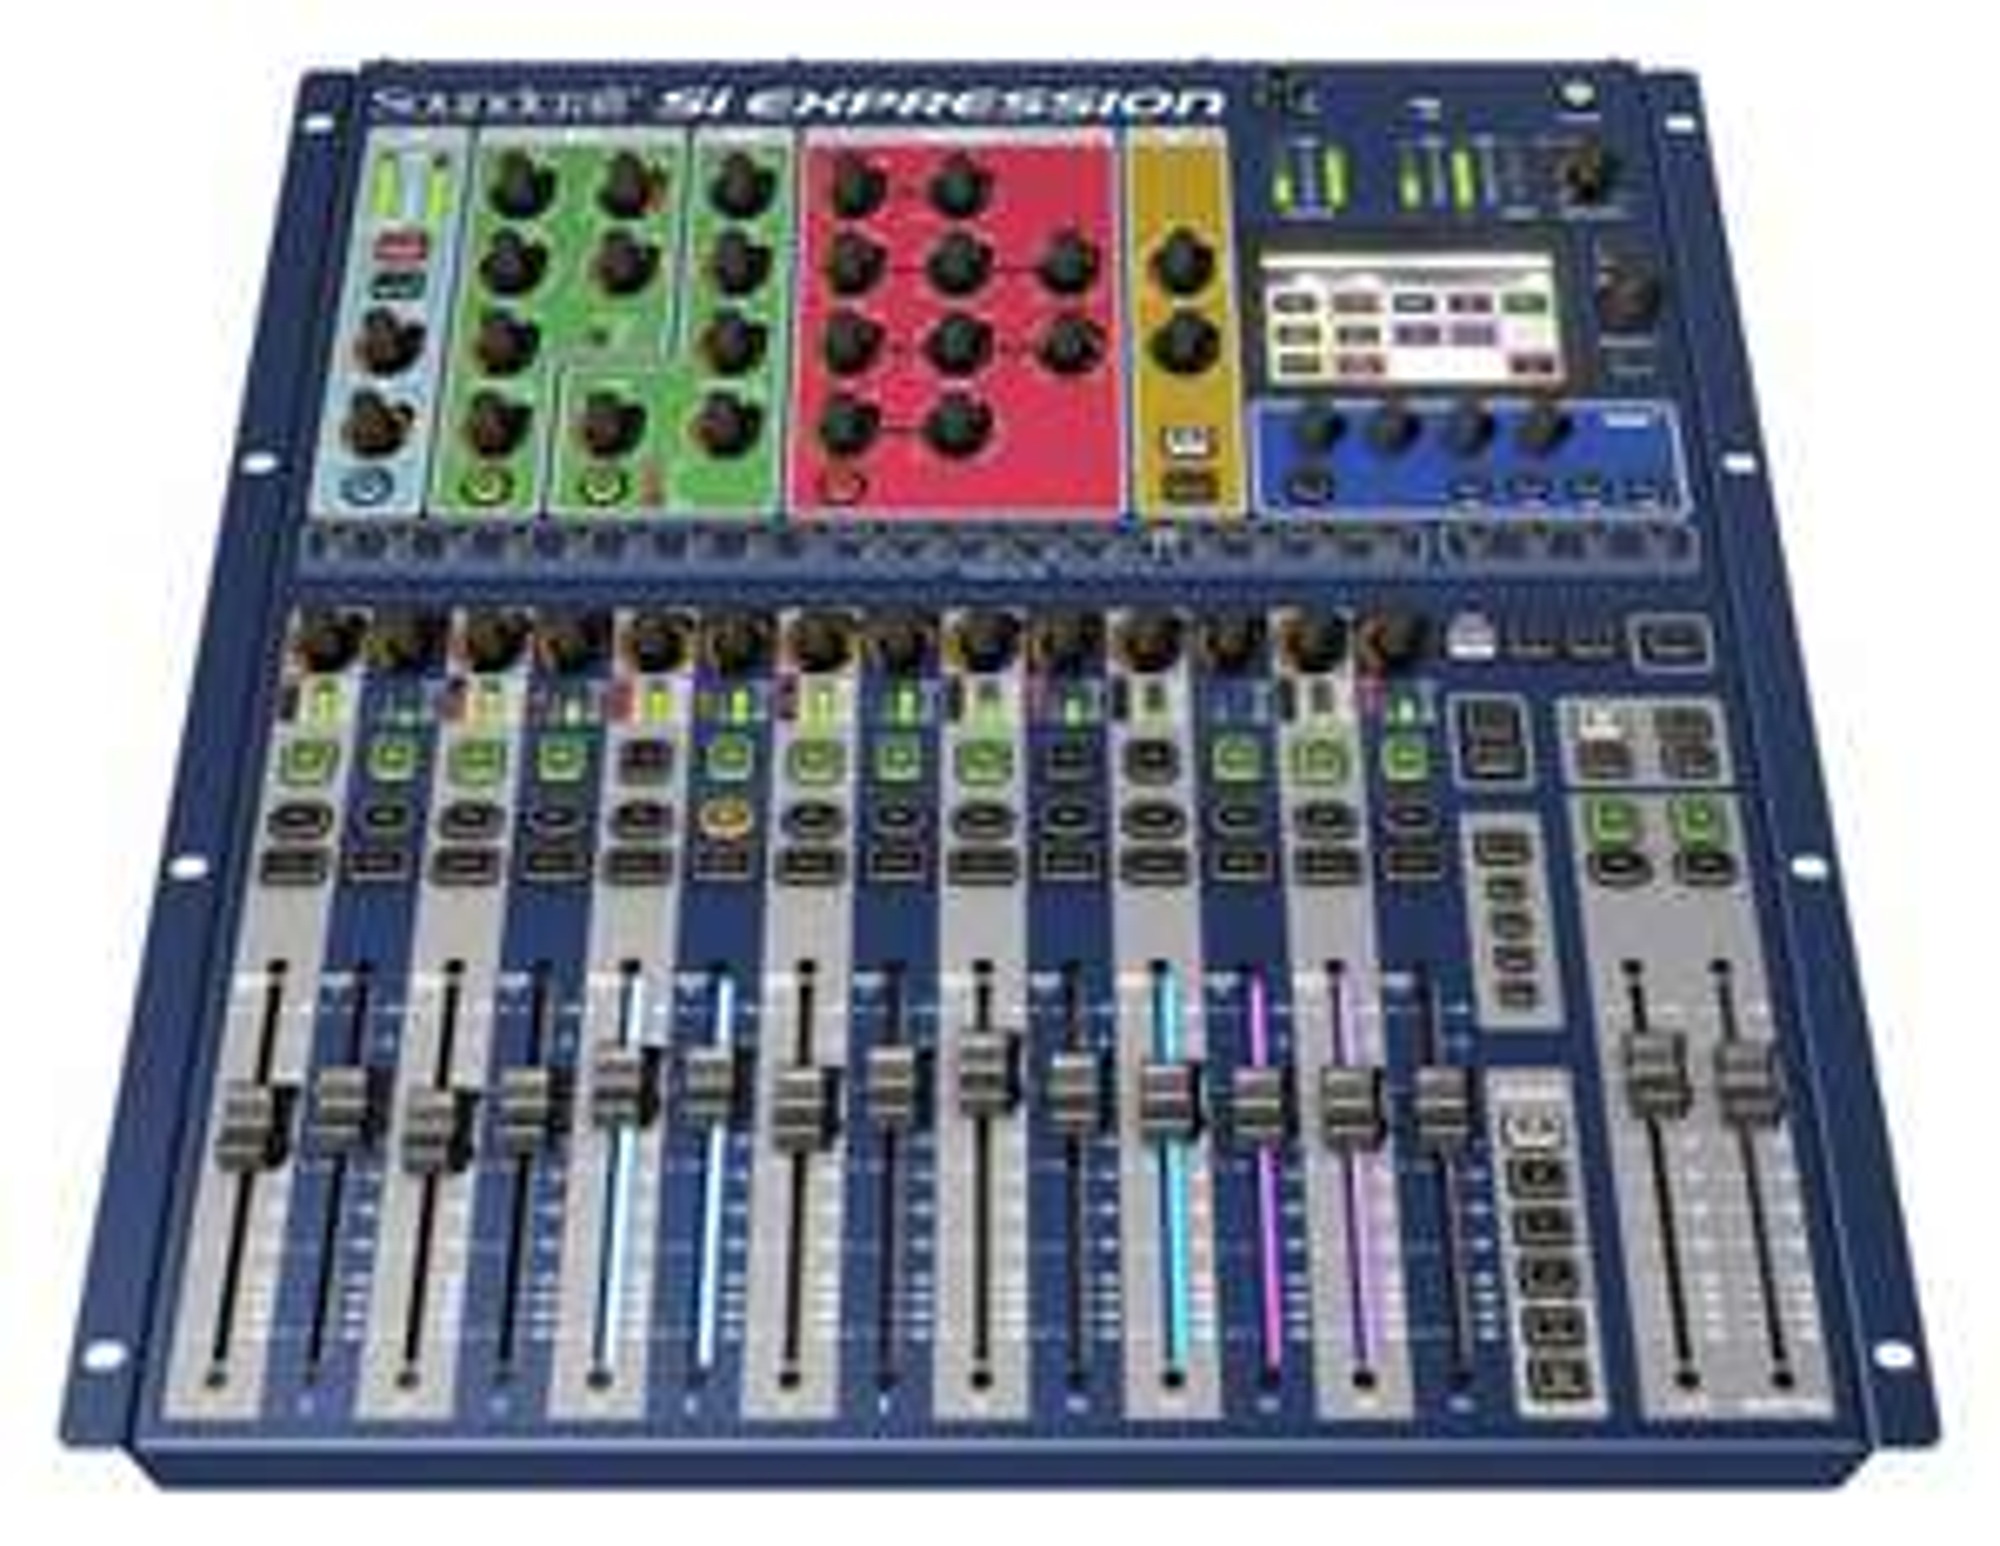 Soundcraft Si Expression 1 Digitalmischpult (68-Kanal, 16 Fader, 40 Bit Floating Point Processing, 16 Mic/Line Eingänge)